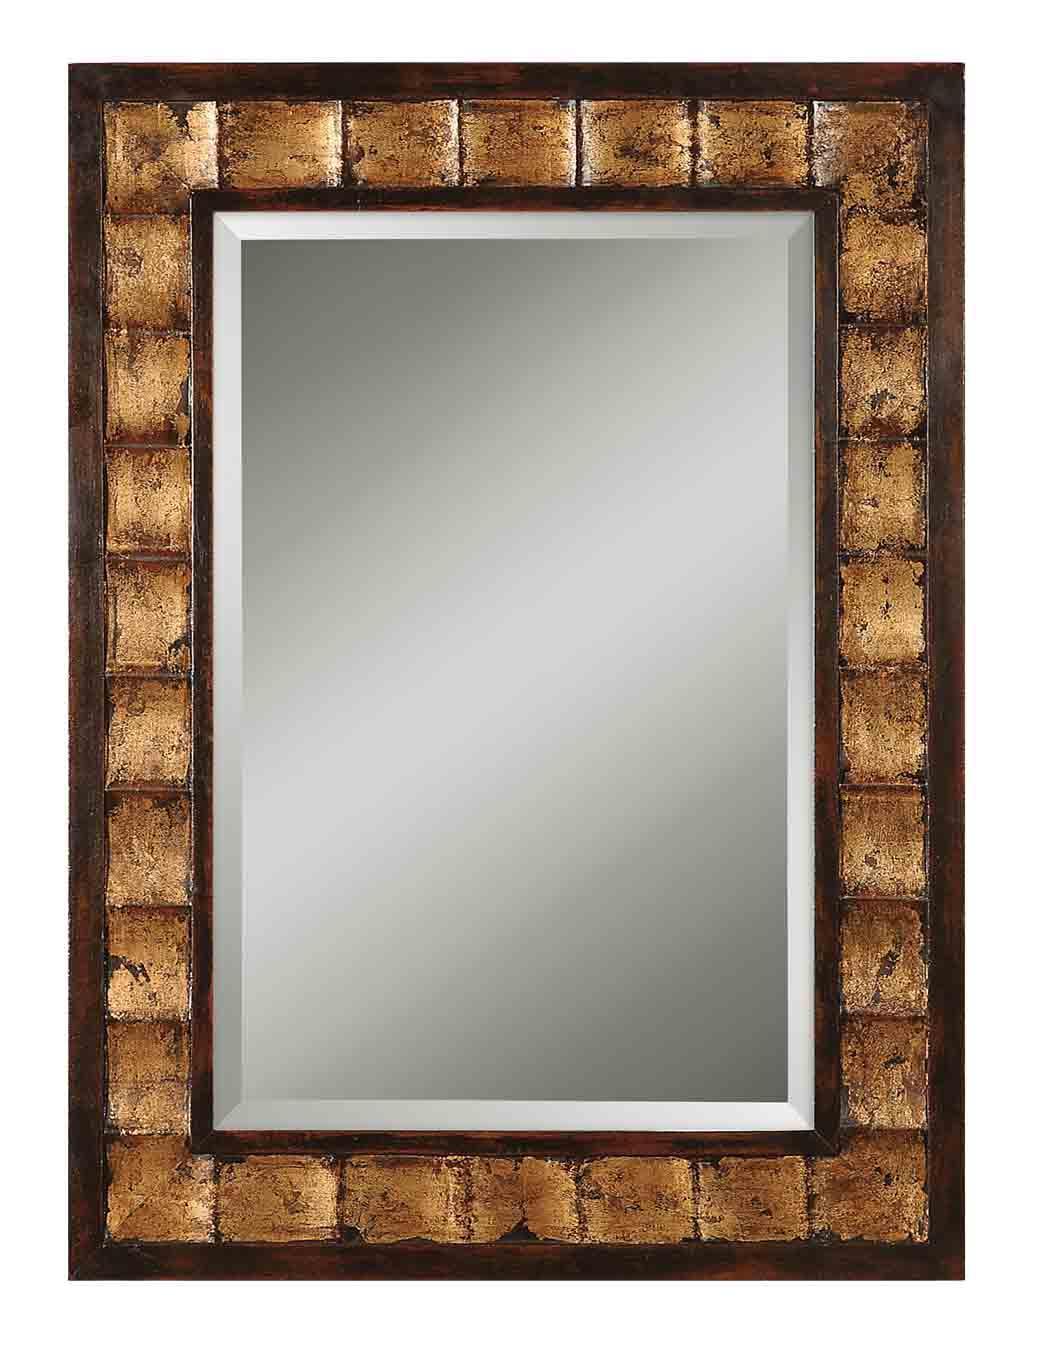 Uttermost Mirrors Justus Mirror - Item Number: 13294 B